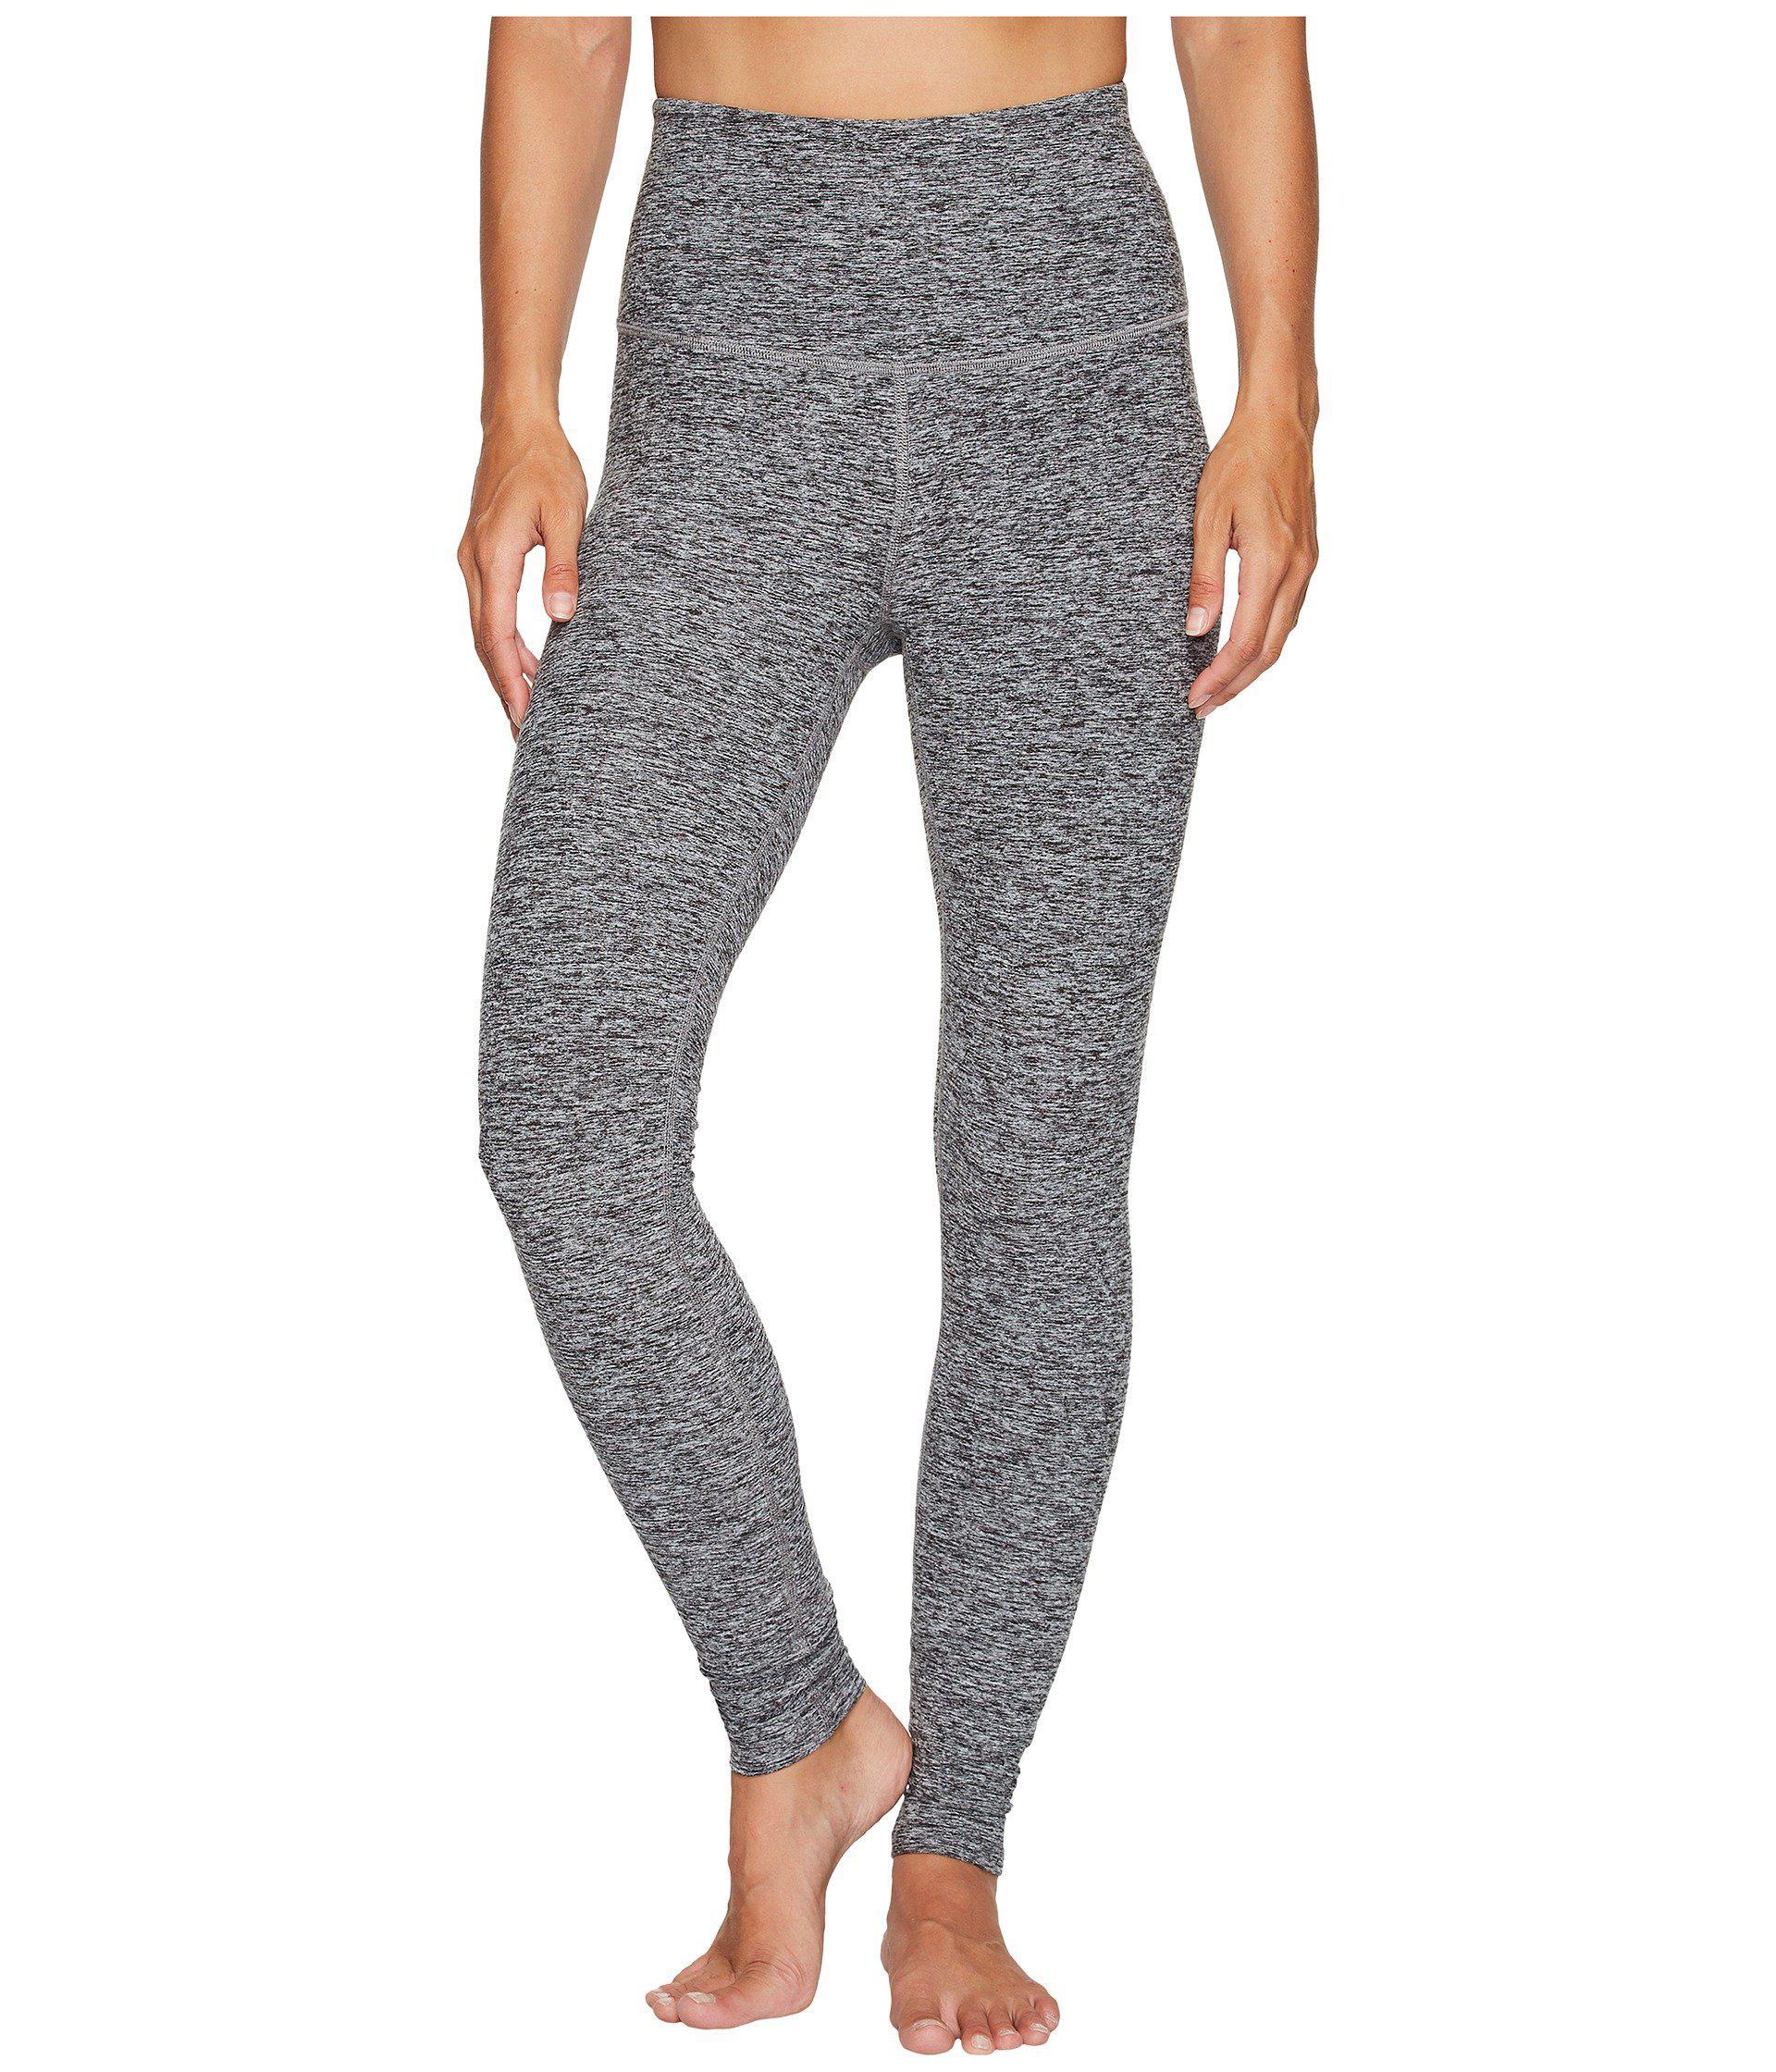 6b0a2ac08eec2 Lyst - Beyond Yoga High Waist Long Legging (black/white) Women's ...